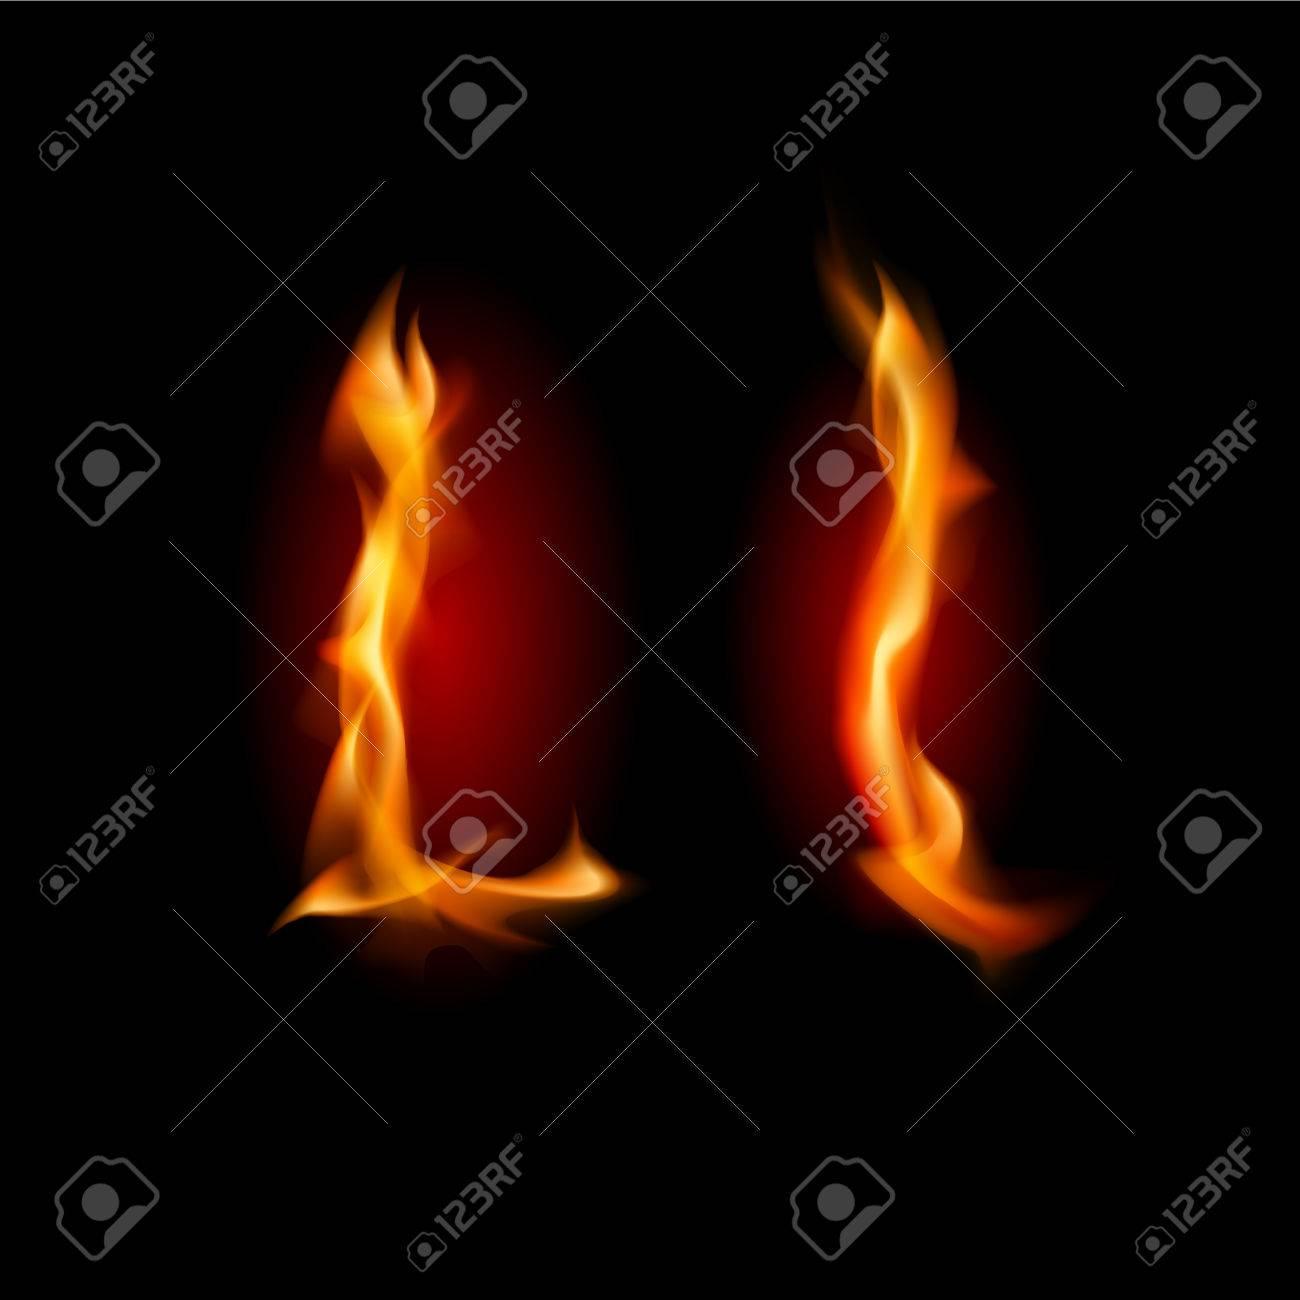 Fiery font. Letter L. Illustration on black background Stock Vector - 11350934